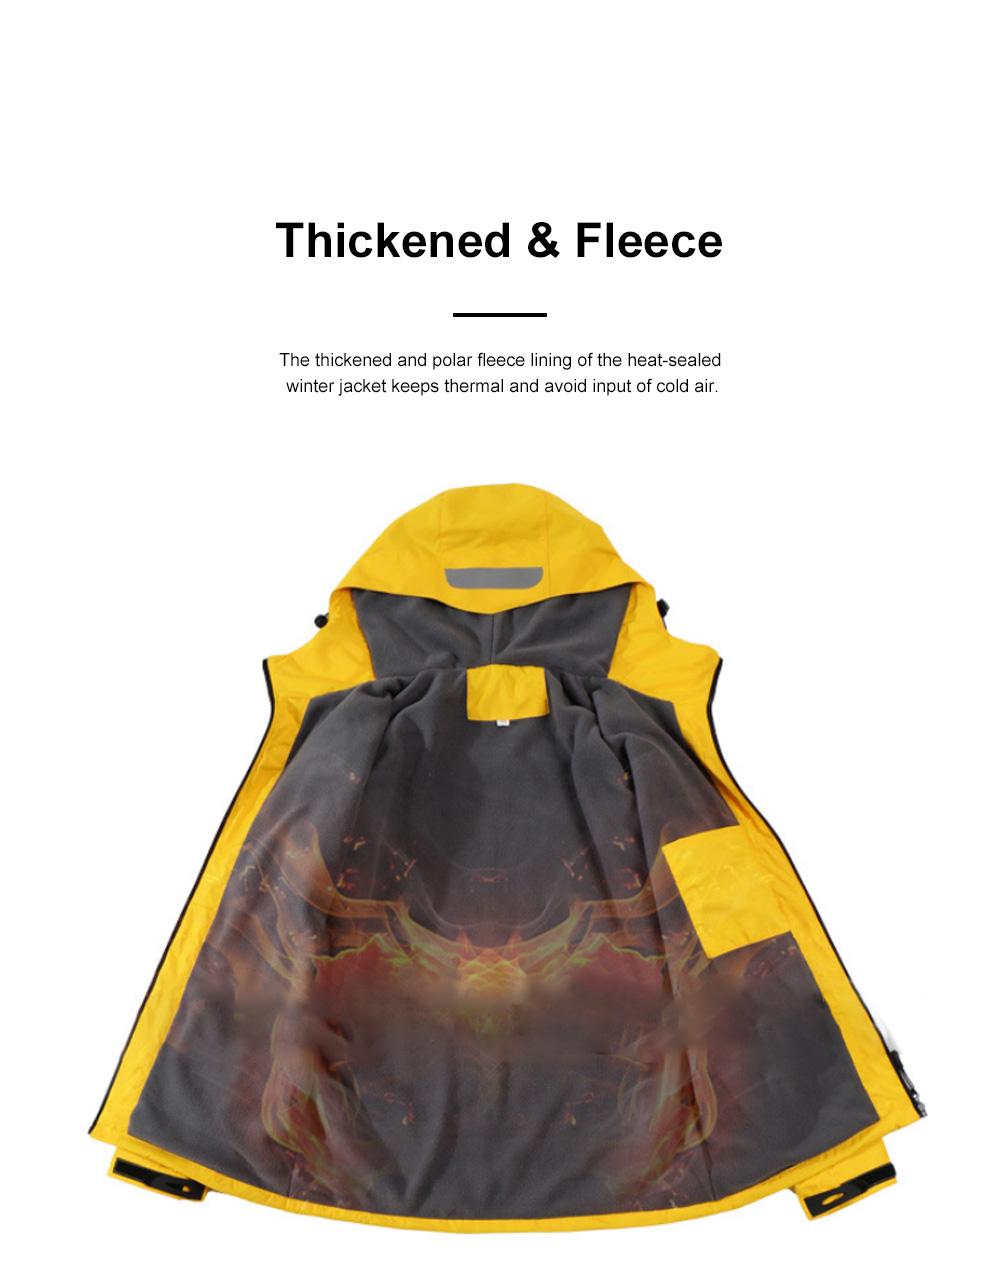 Lovers' Heat-sealed Winter Jacket for Outdoors Hiking Climbing Thickened Waterproof Interchange Jacket Polar Fleece Liner Outdoor Jacket 1